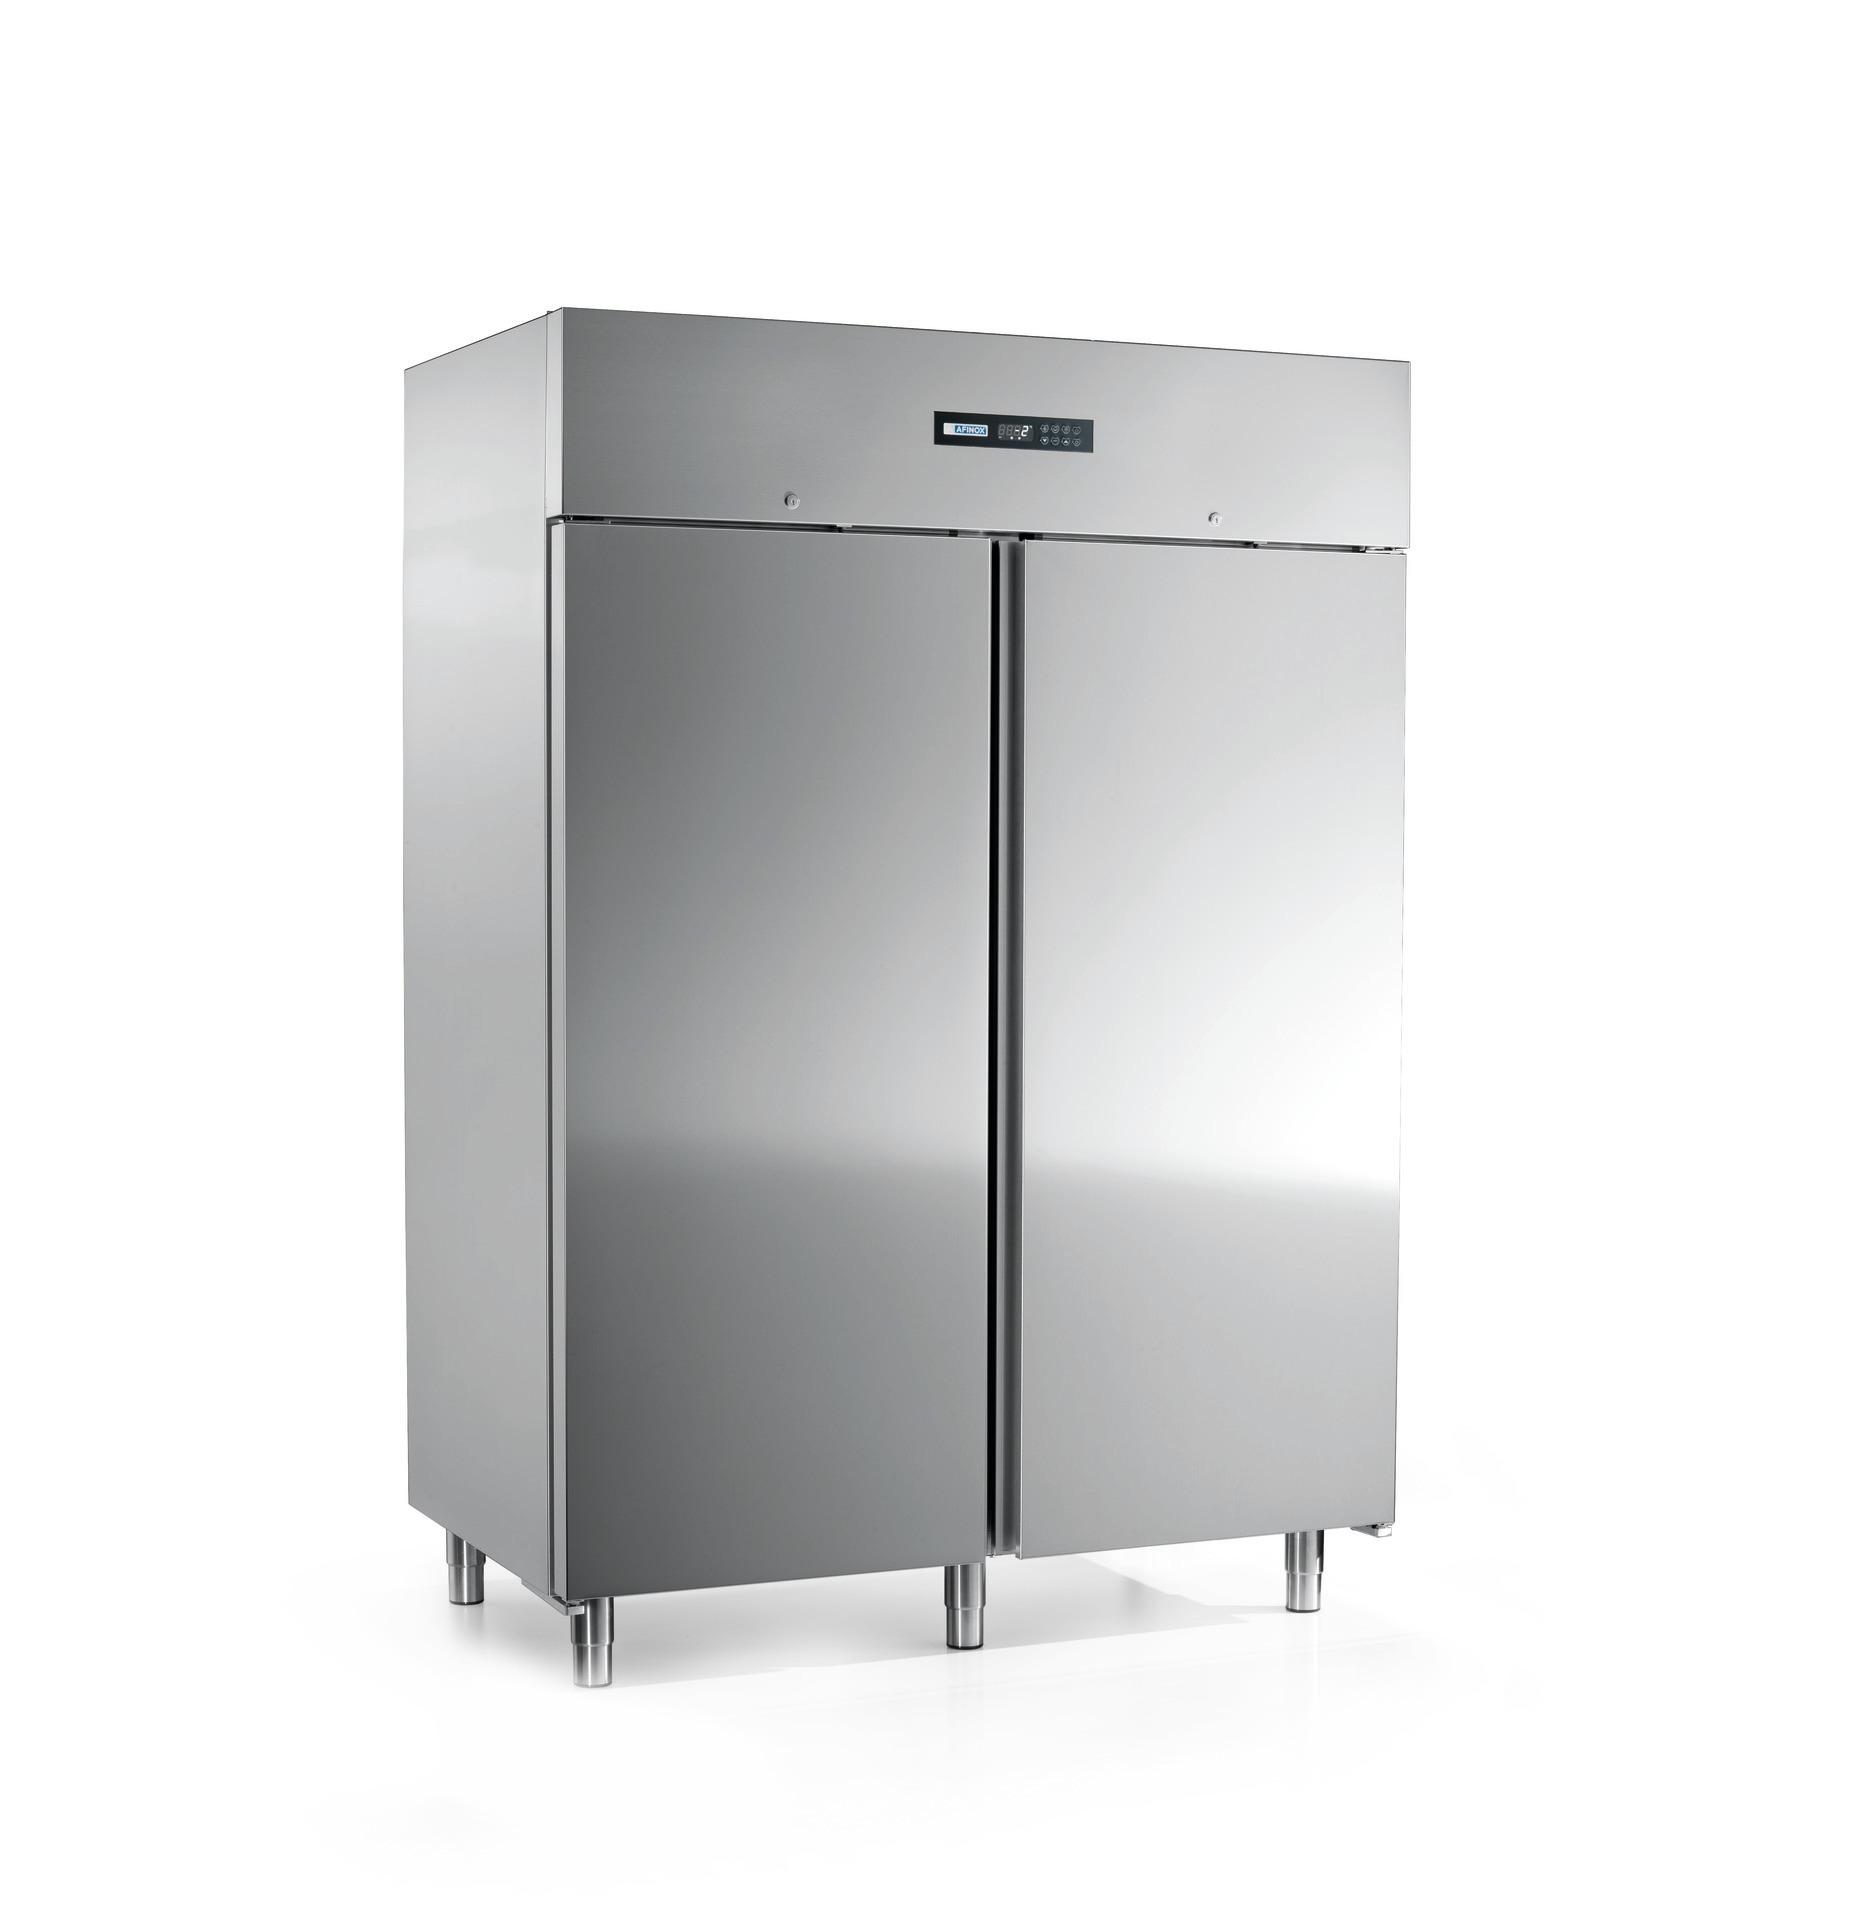 Tiefkühlschrank 1400 l GN 2/1